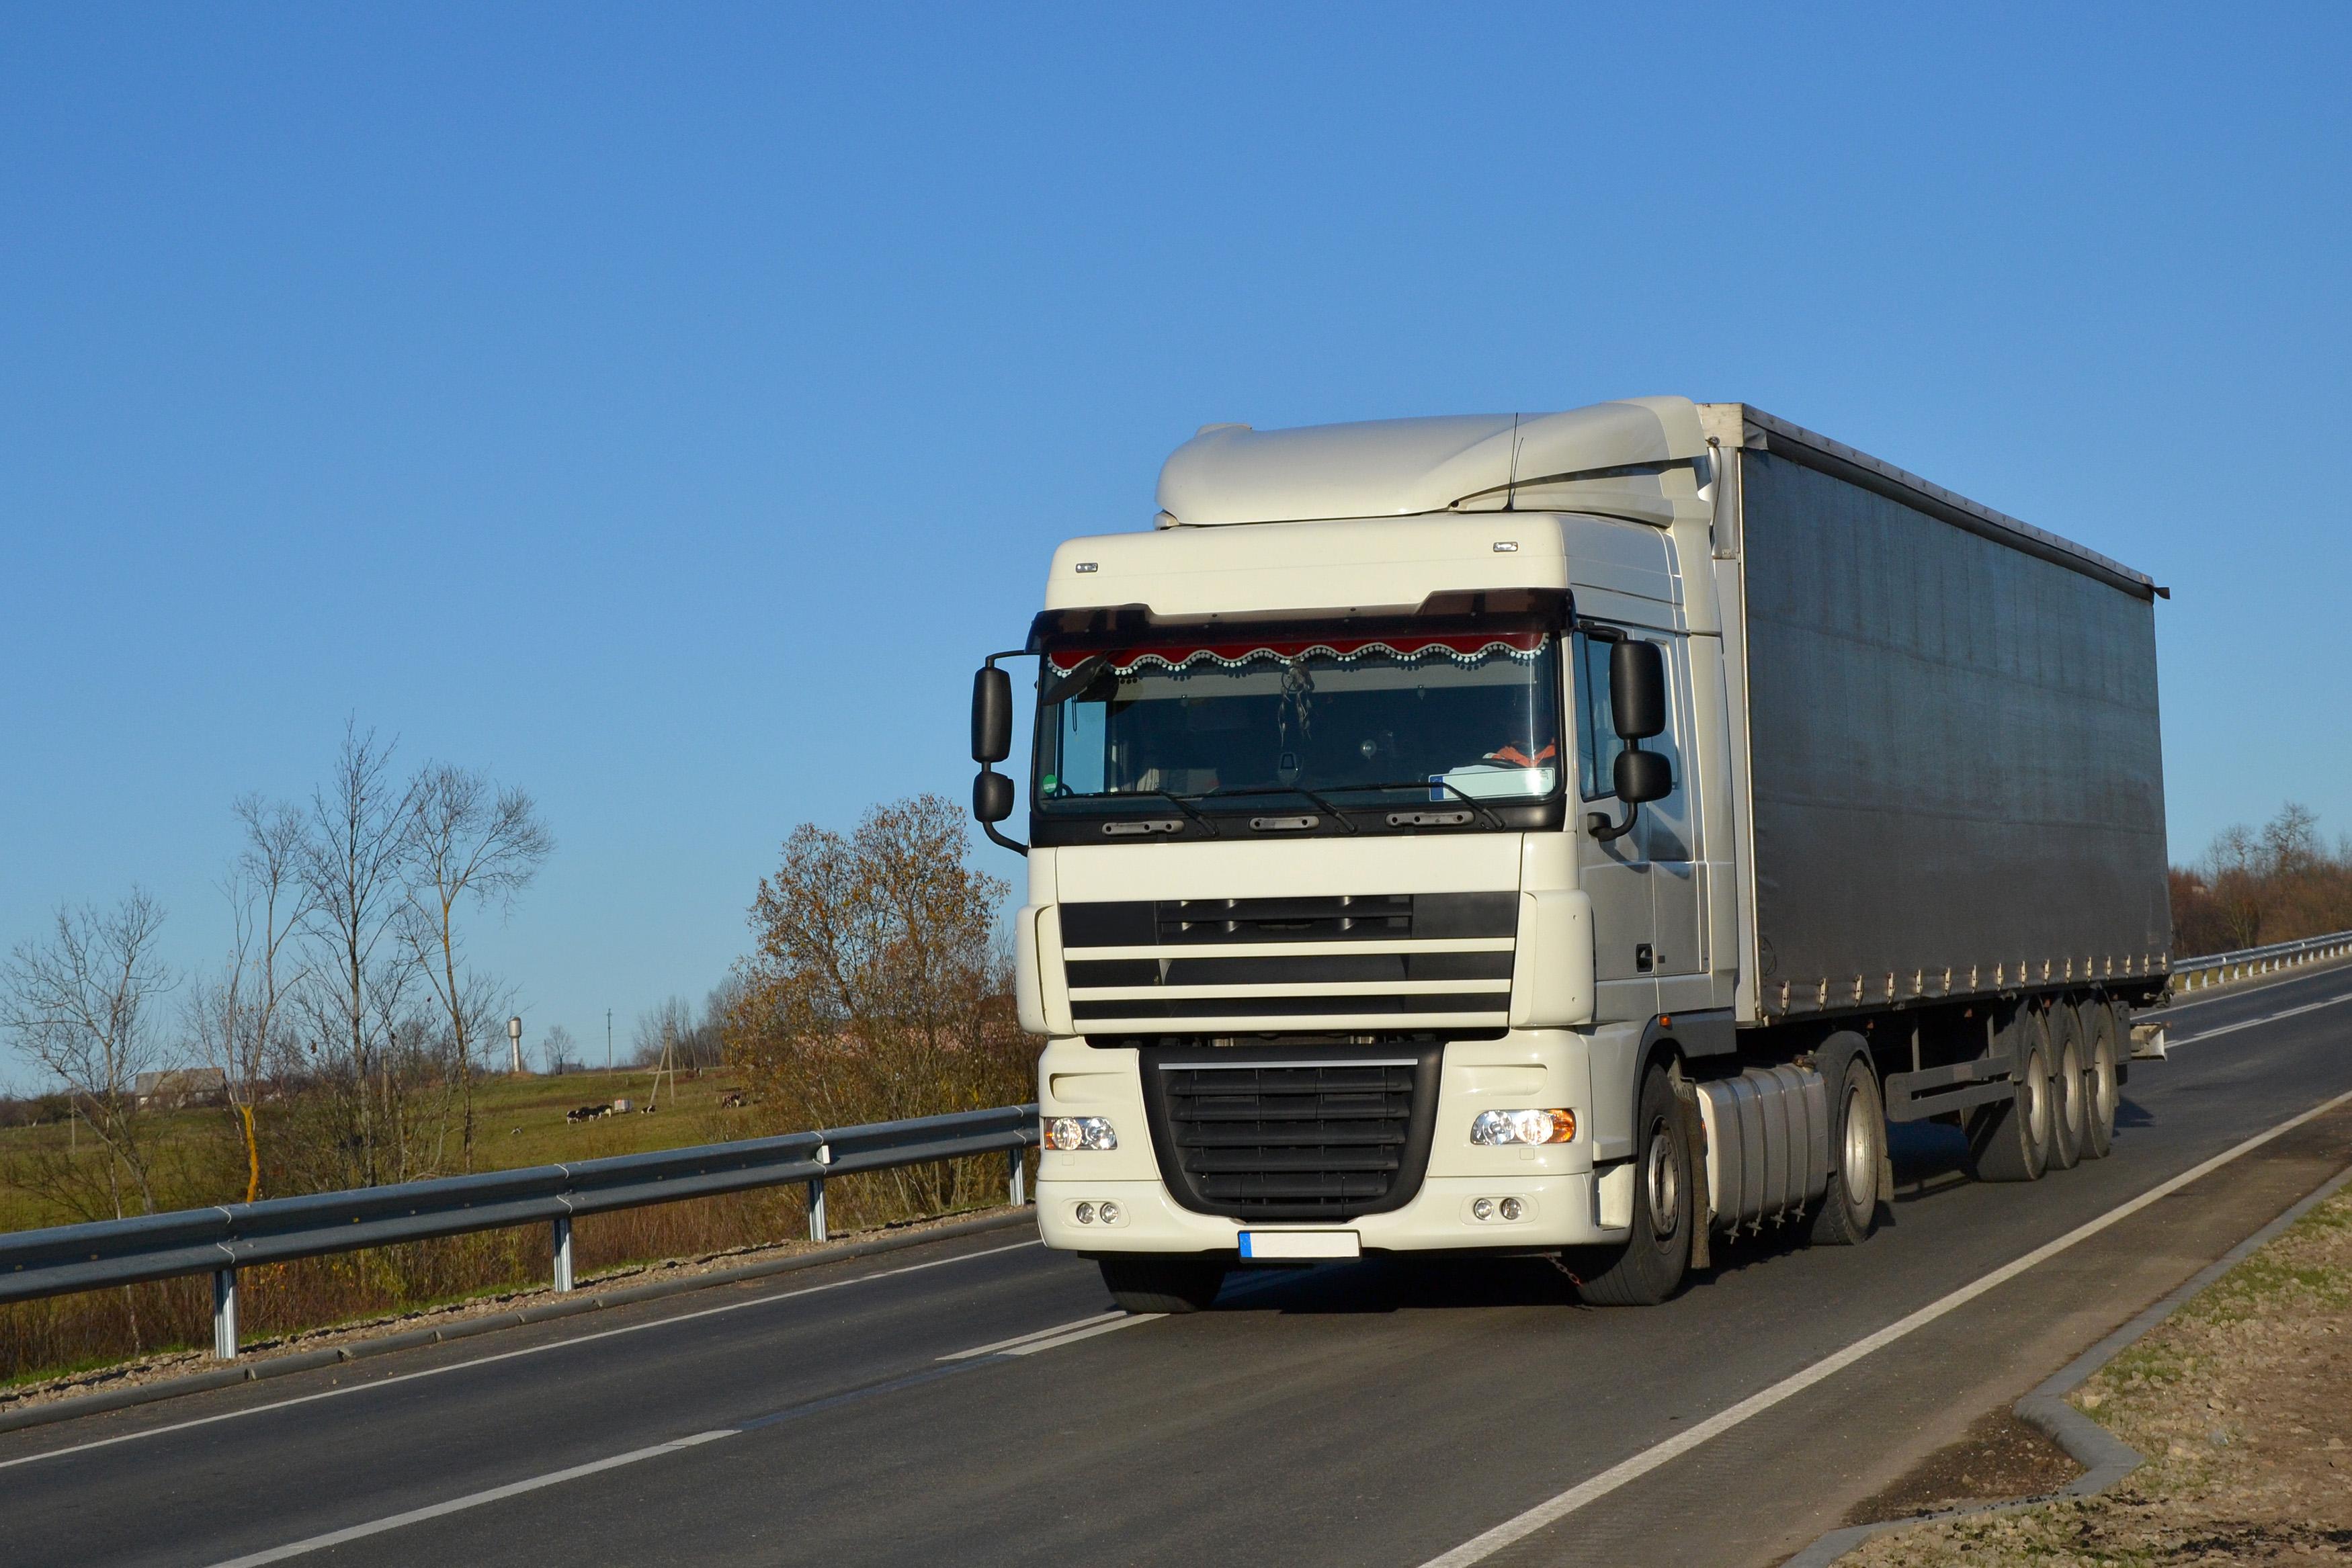 DAF XF lorry, Automobile, Road, Semi-trailer, Semitrailer, HQ Photo